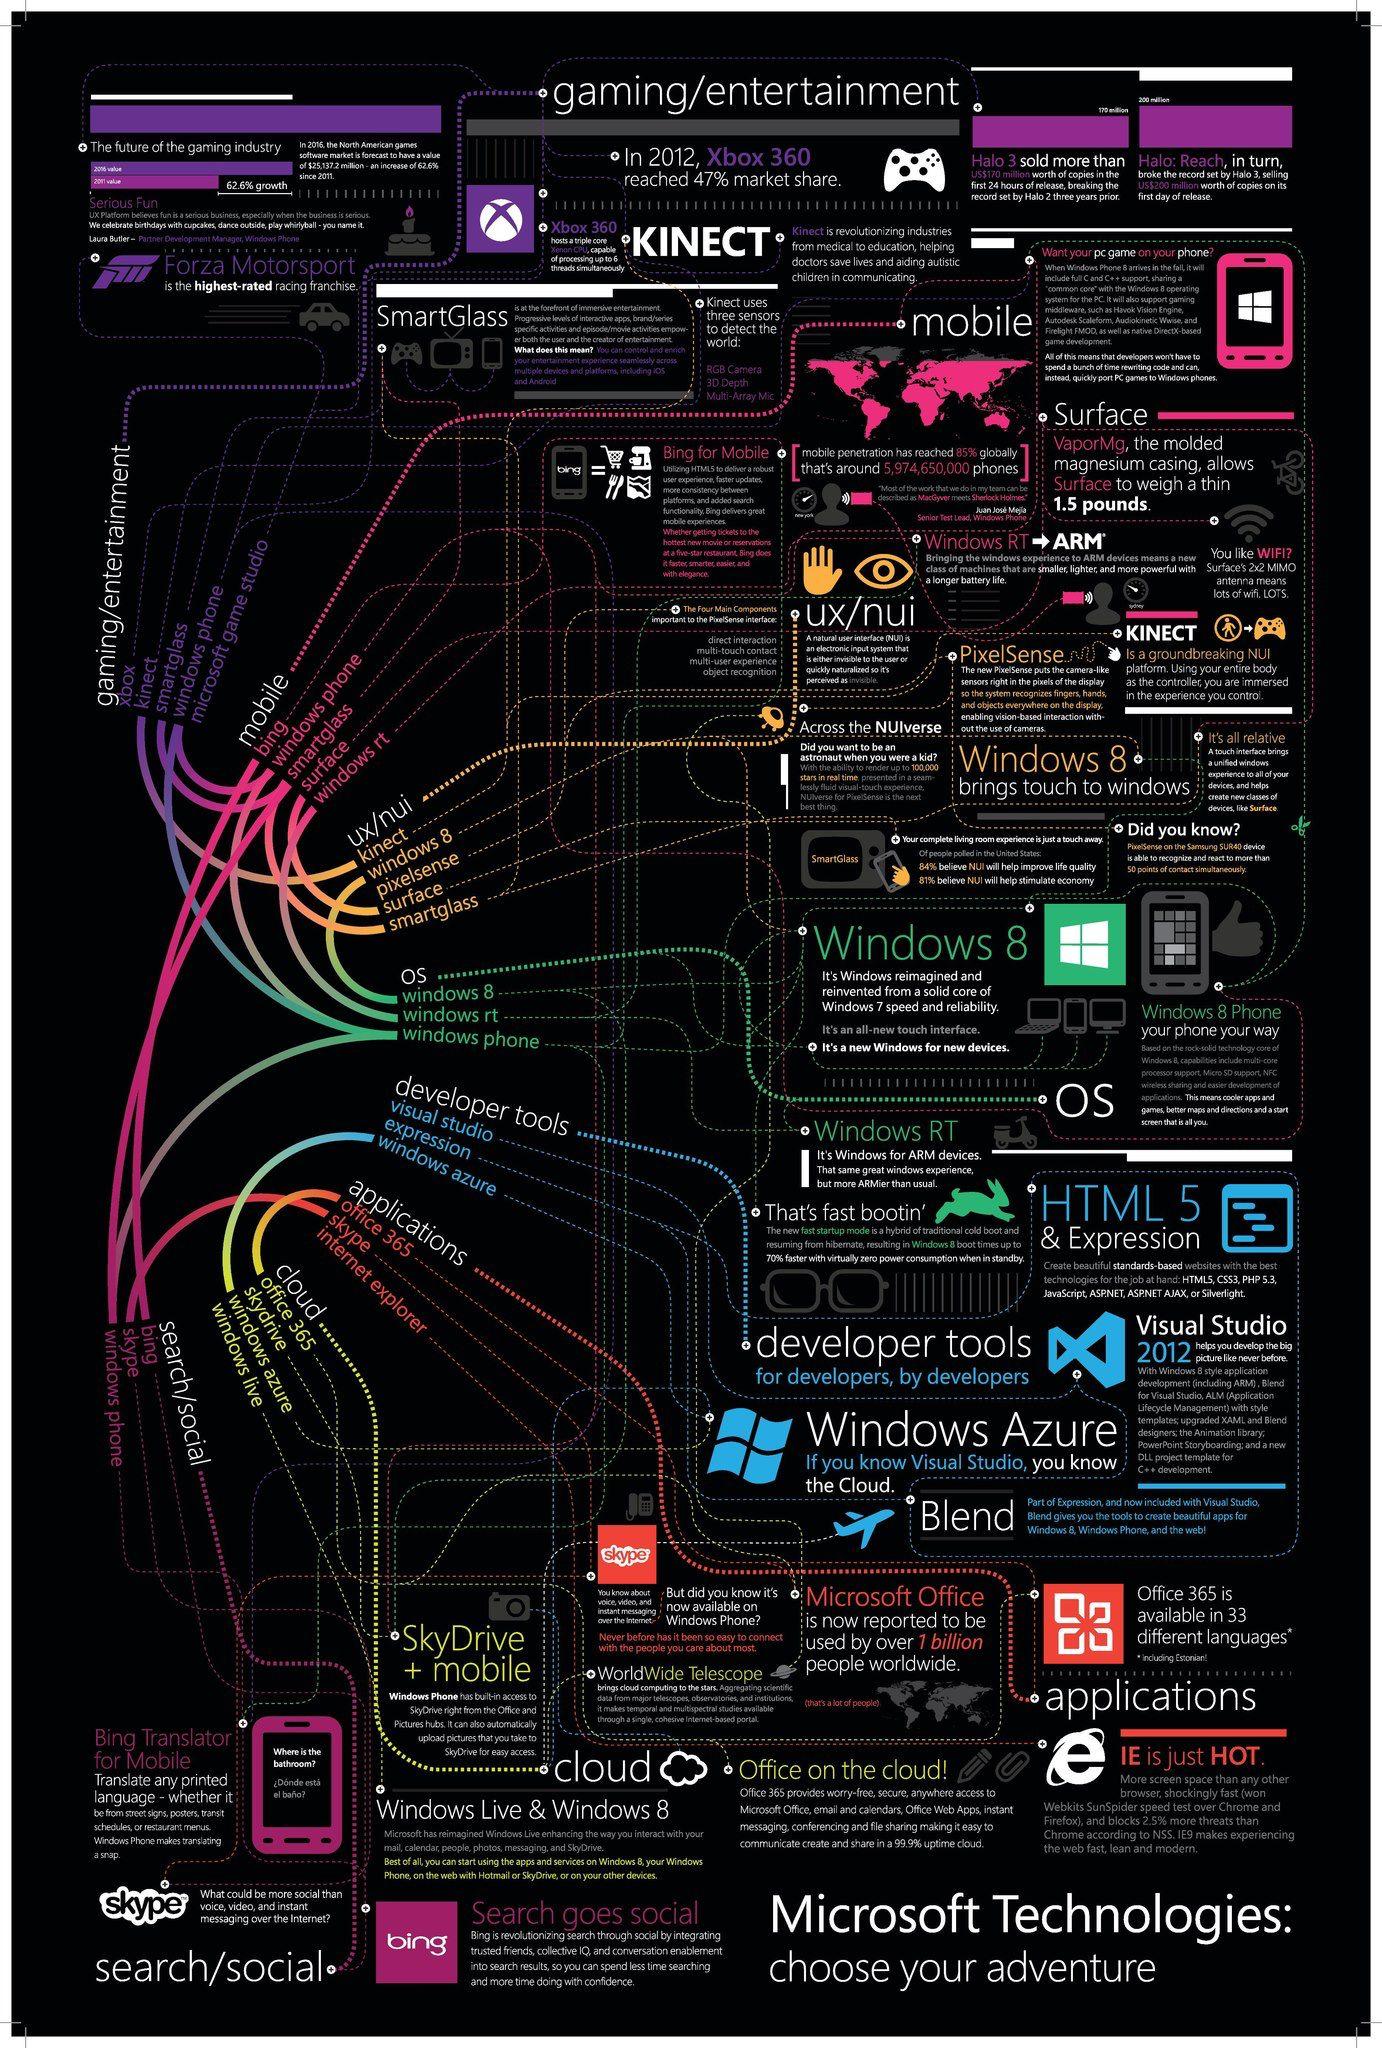 Infographic: Microsoft Technologies